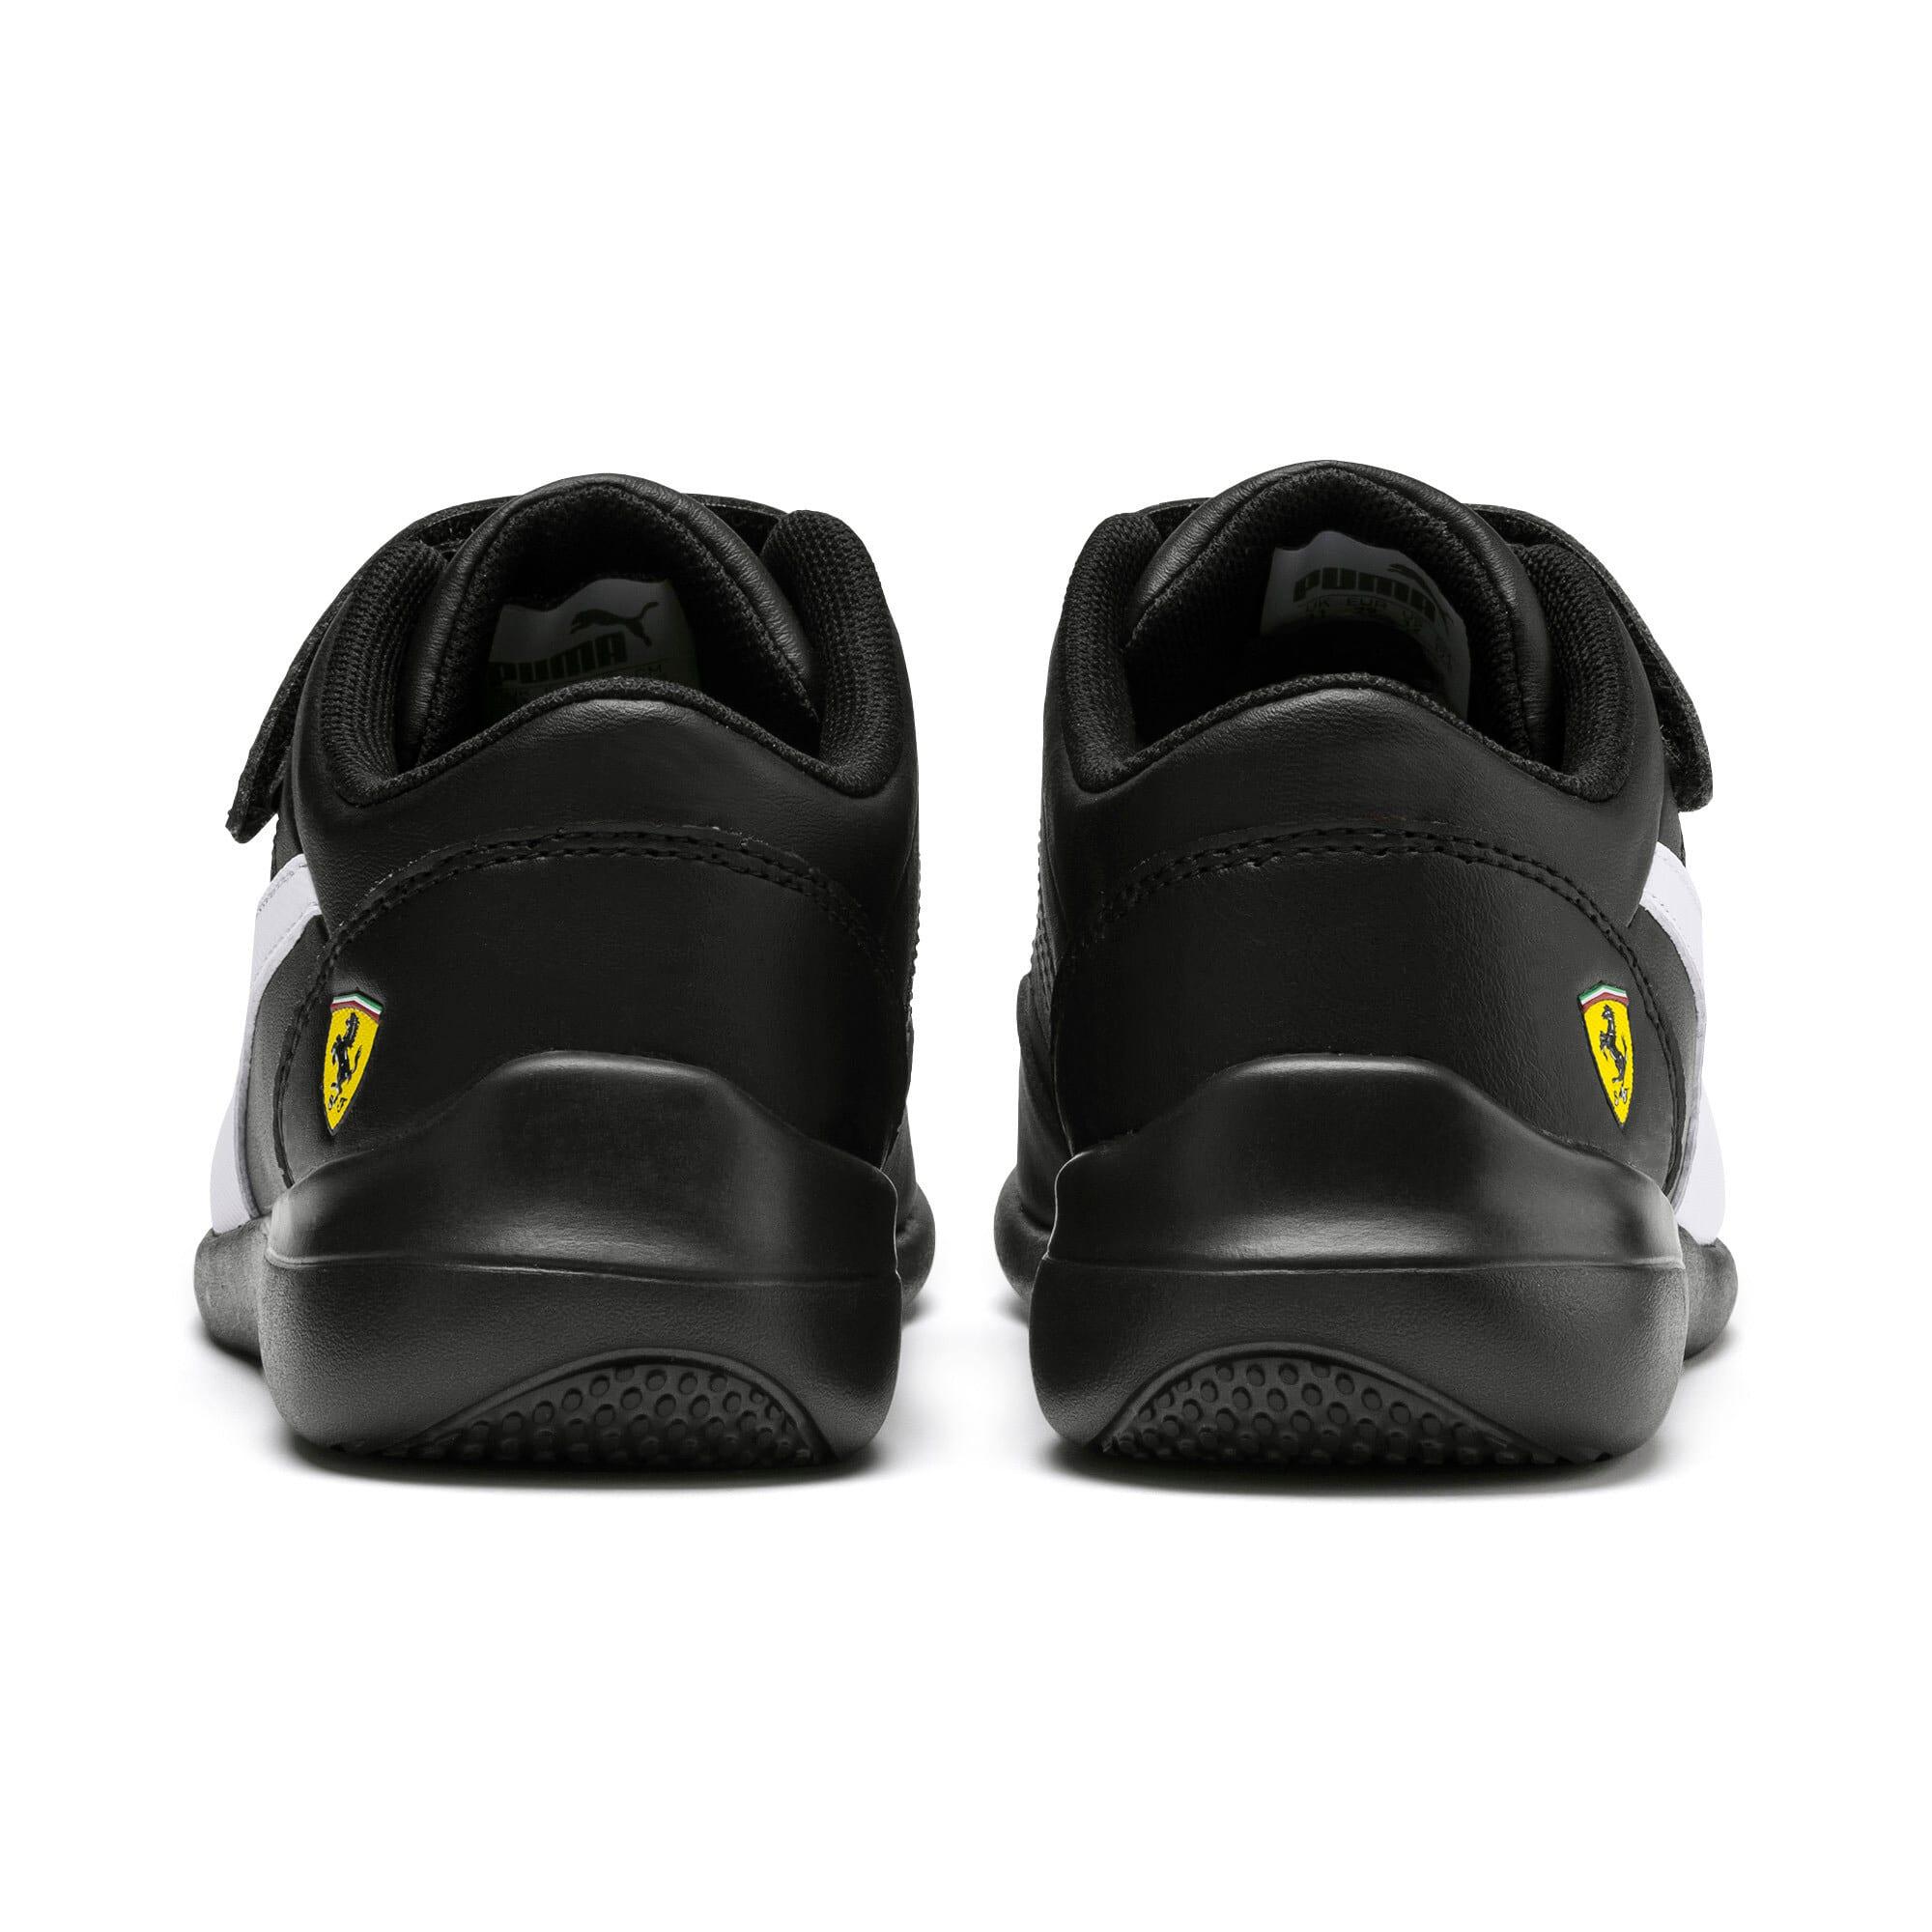 Thumbnail 3 of Ferrari Kart Cat III Kids Sneaker, Black-White-Blazing Yellow, medium